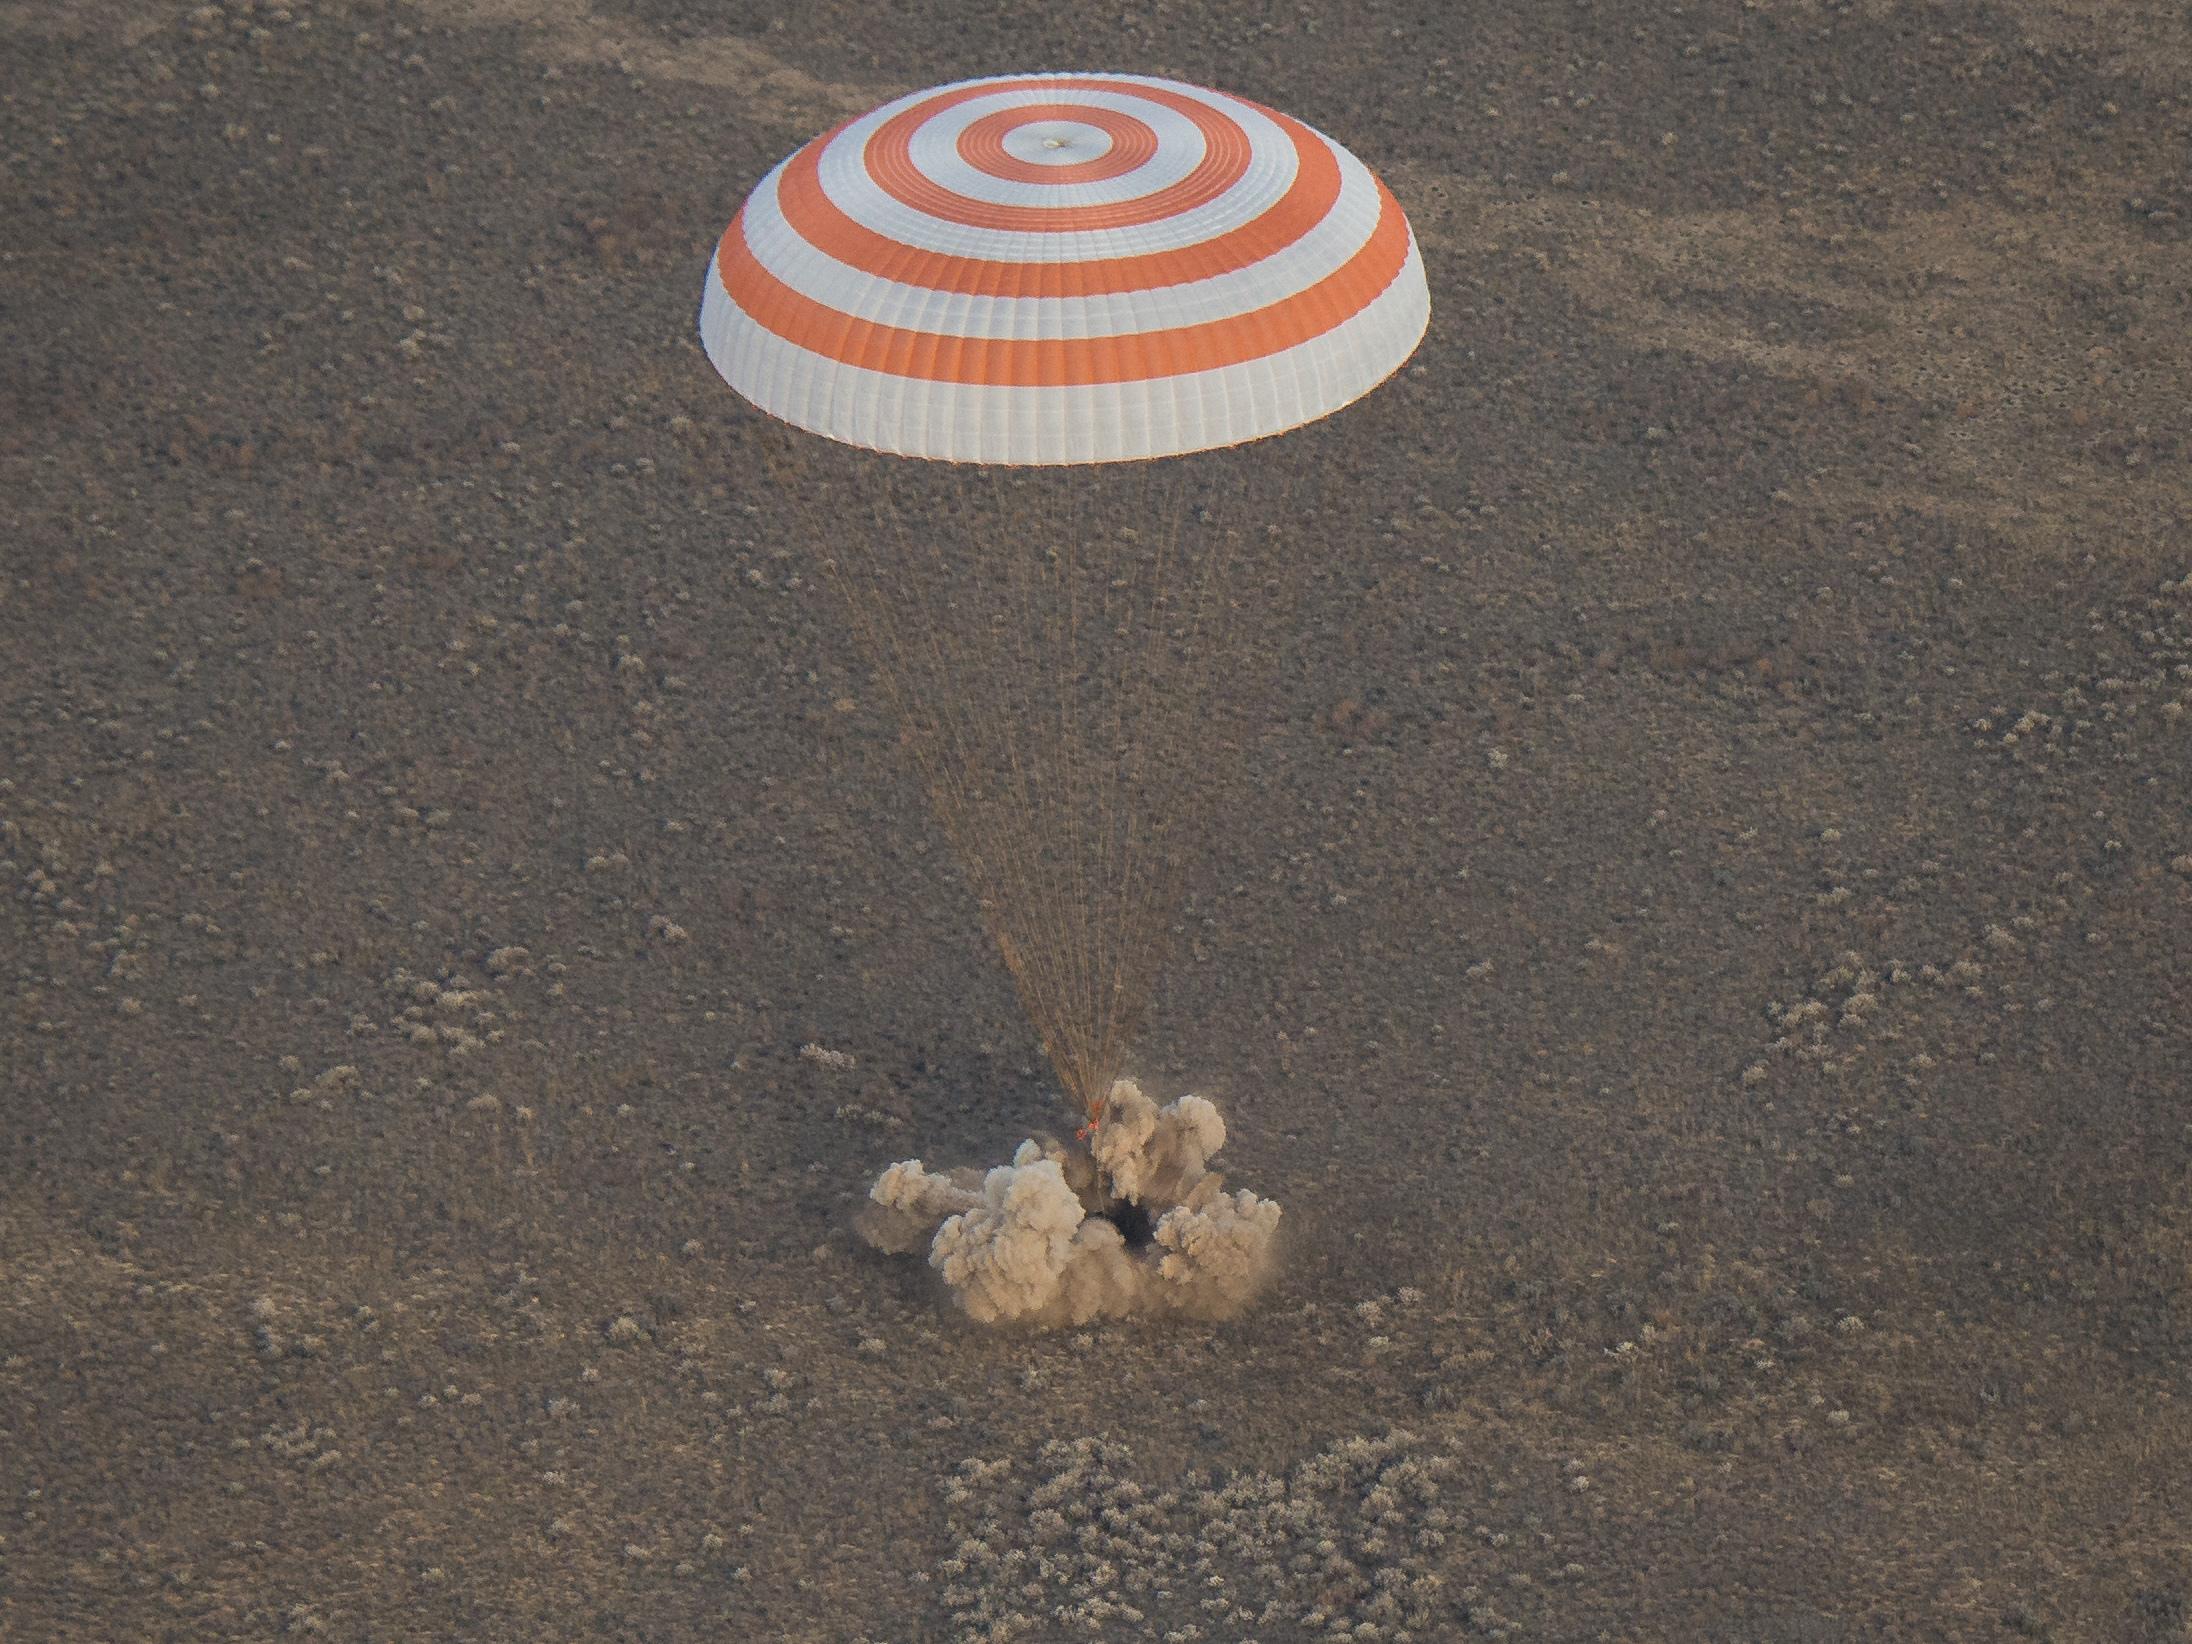 The Soyuz MS-01 spacecraft lands in Kazakhstan on Sunday. Bill Ingalls/NASA.